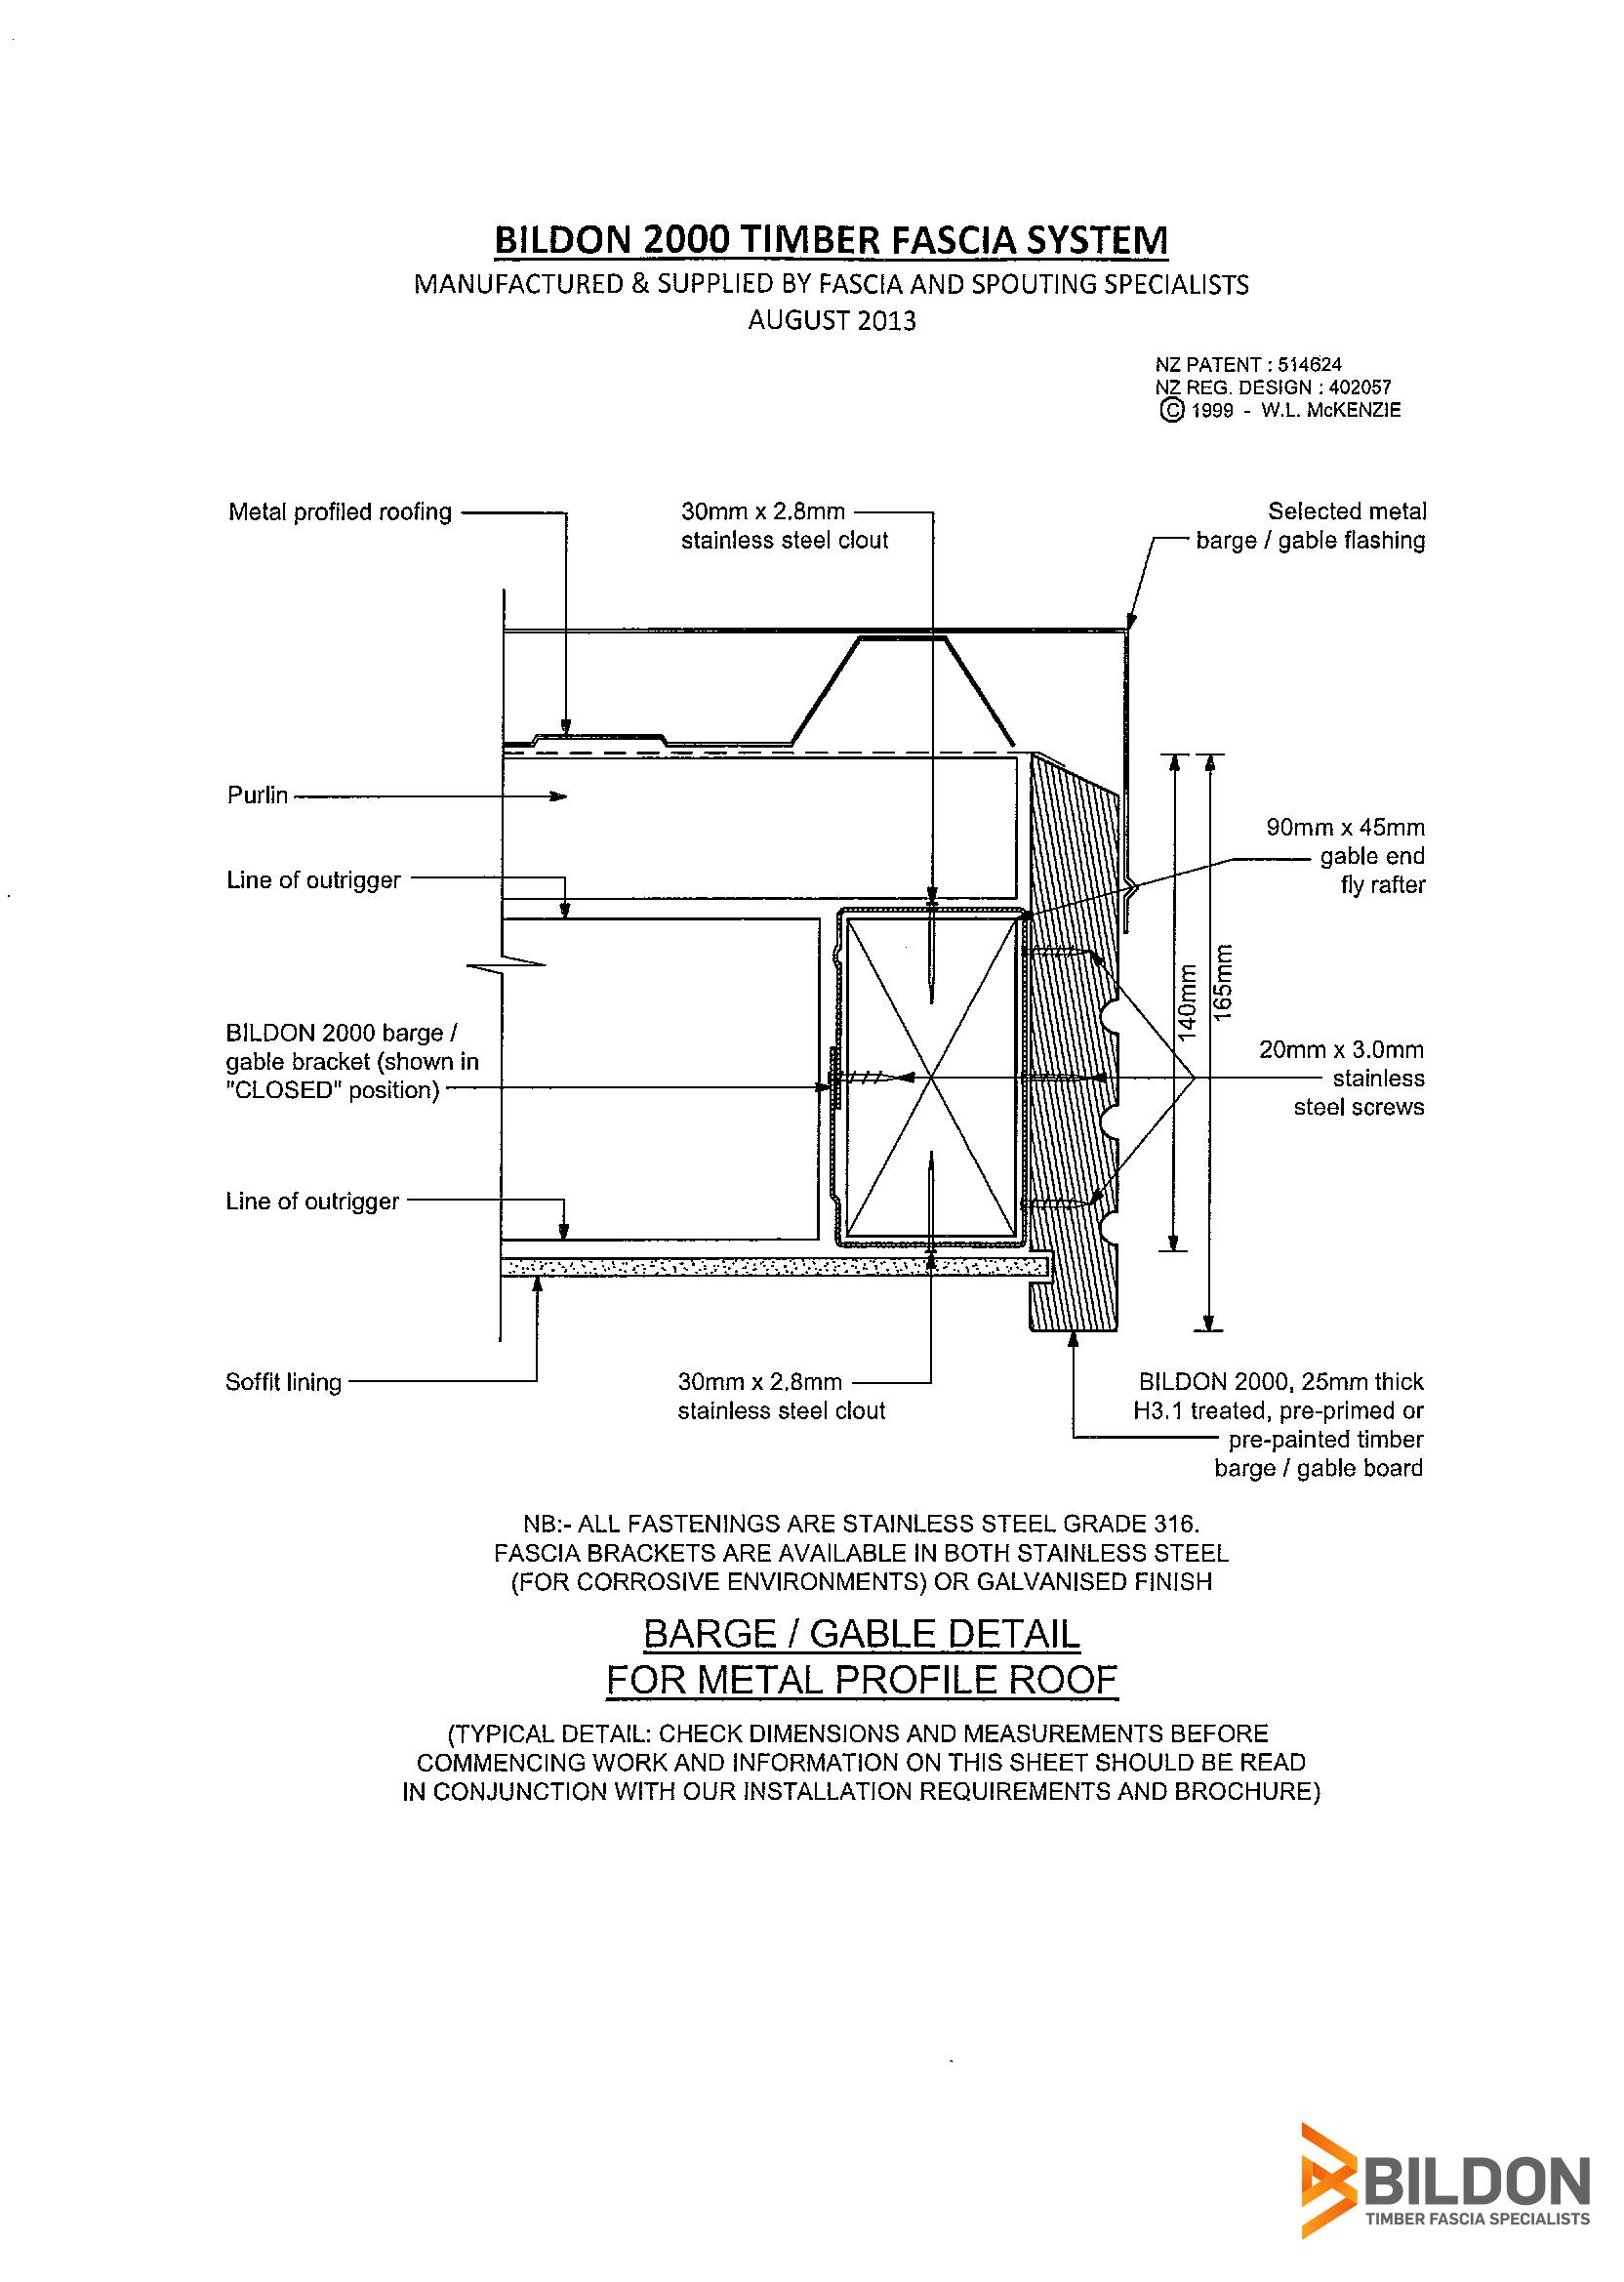 Barge:Gable Detail for Metal Profile Roof.jpg